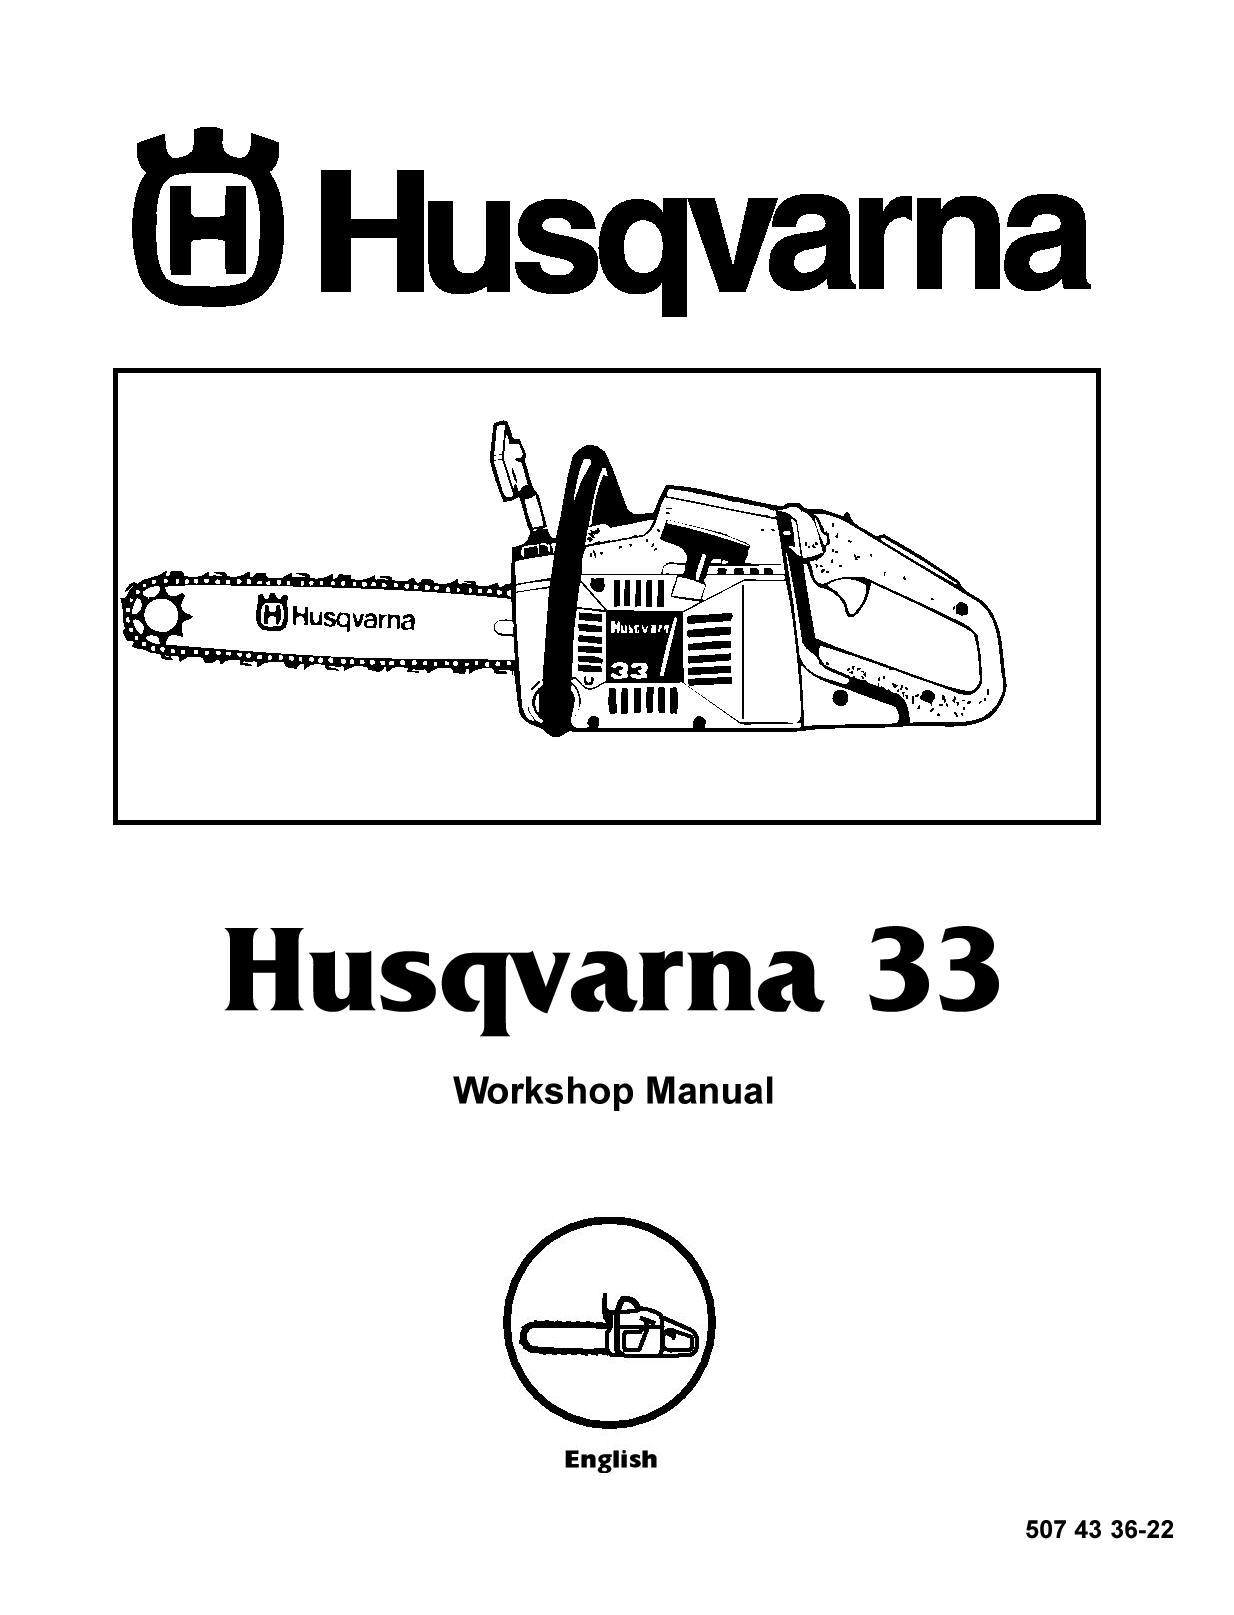 Husqvarna manuals ebook husqvarna blower 125bvx array husqvarna 33 chainsaw workshop manual ebooks home and garden rh store payloadz fandeluxe Image collections